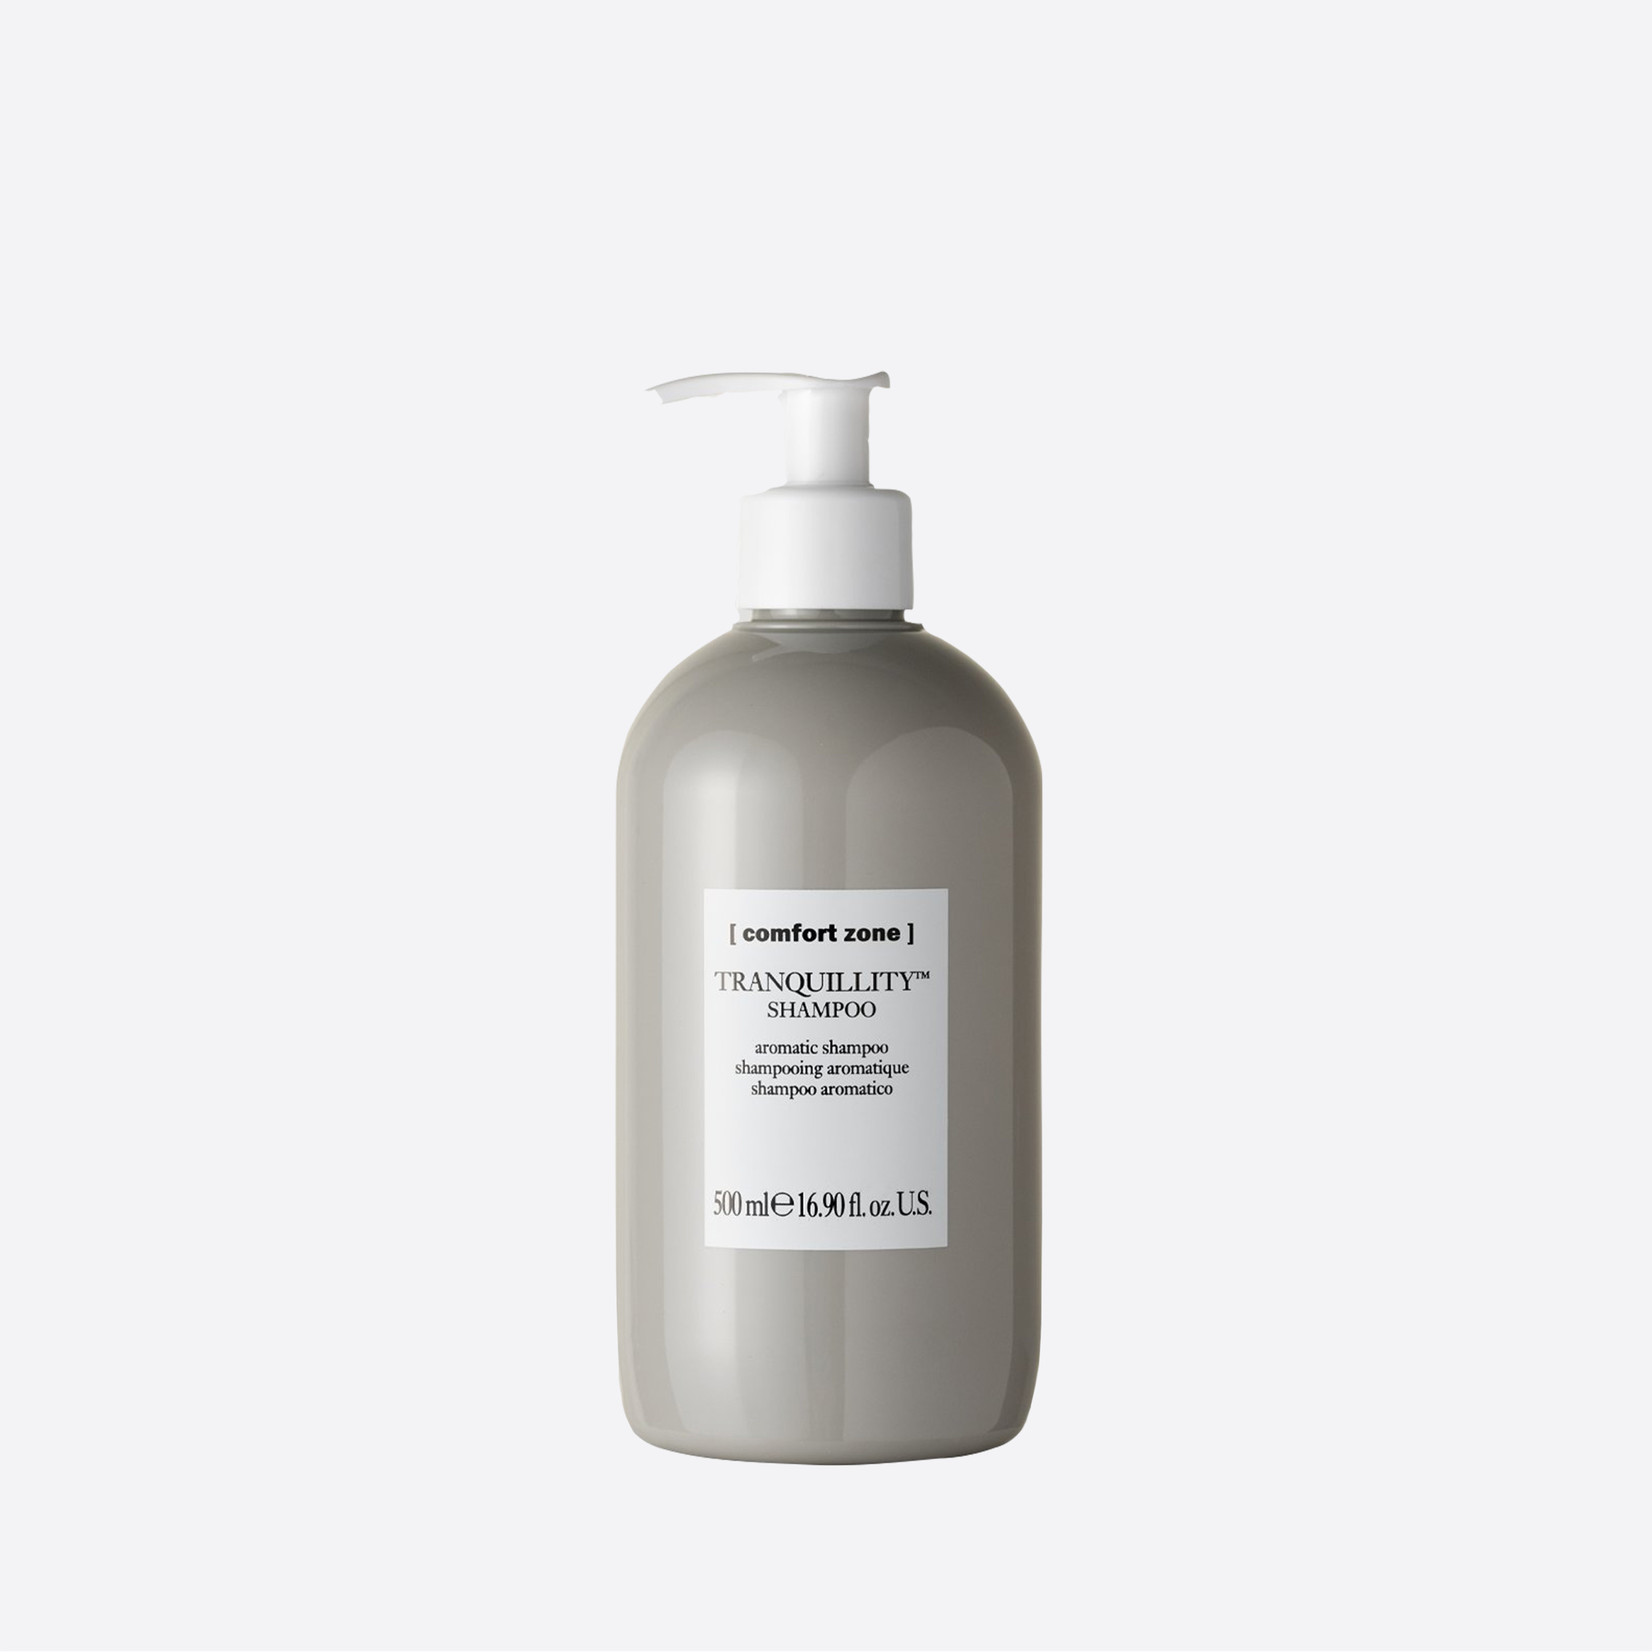 Comfort Zone Tranquility Shampoo